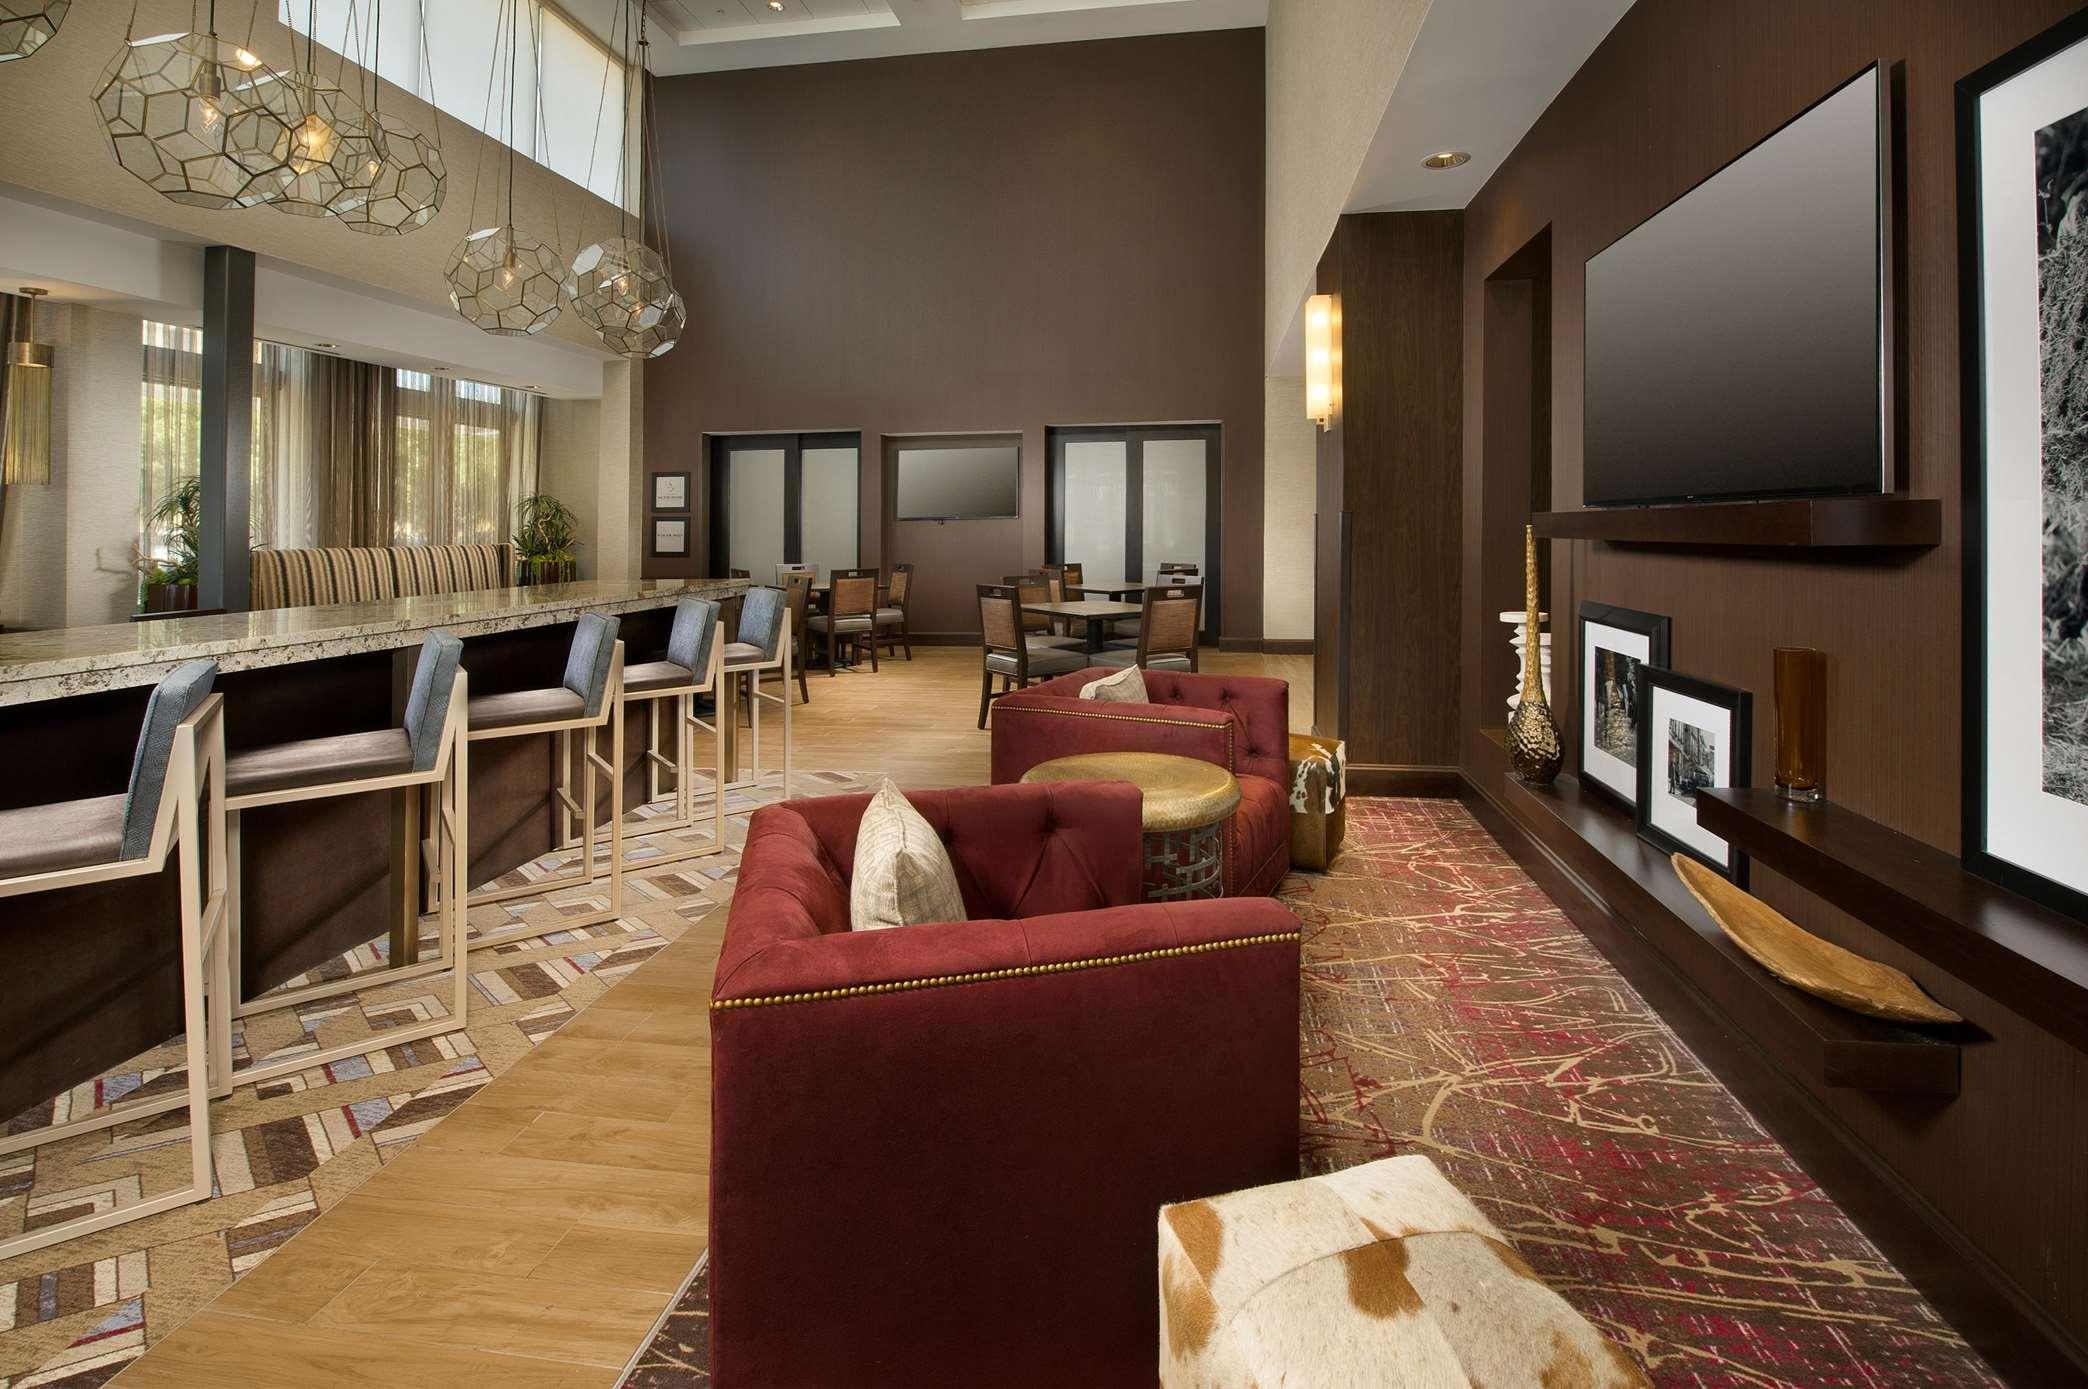 Hampton Inn & Suites San Antonio-Downtown/Market Square image 2